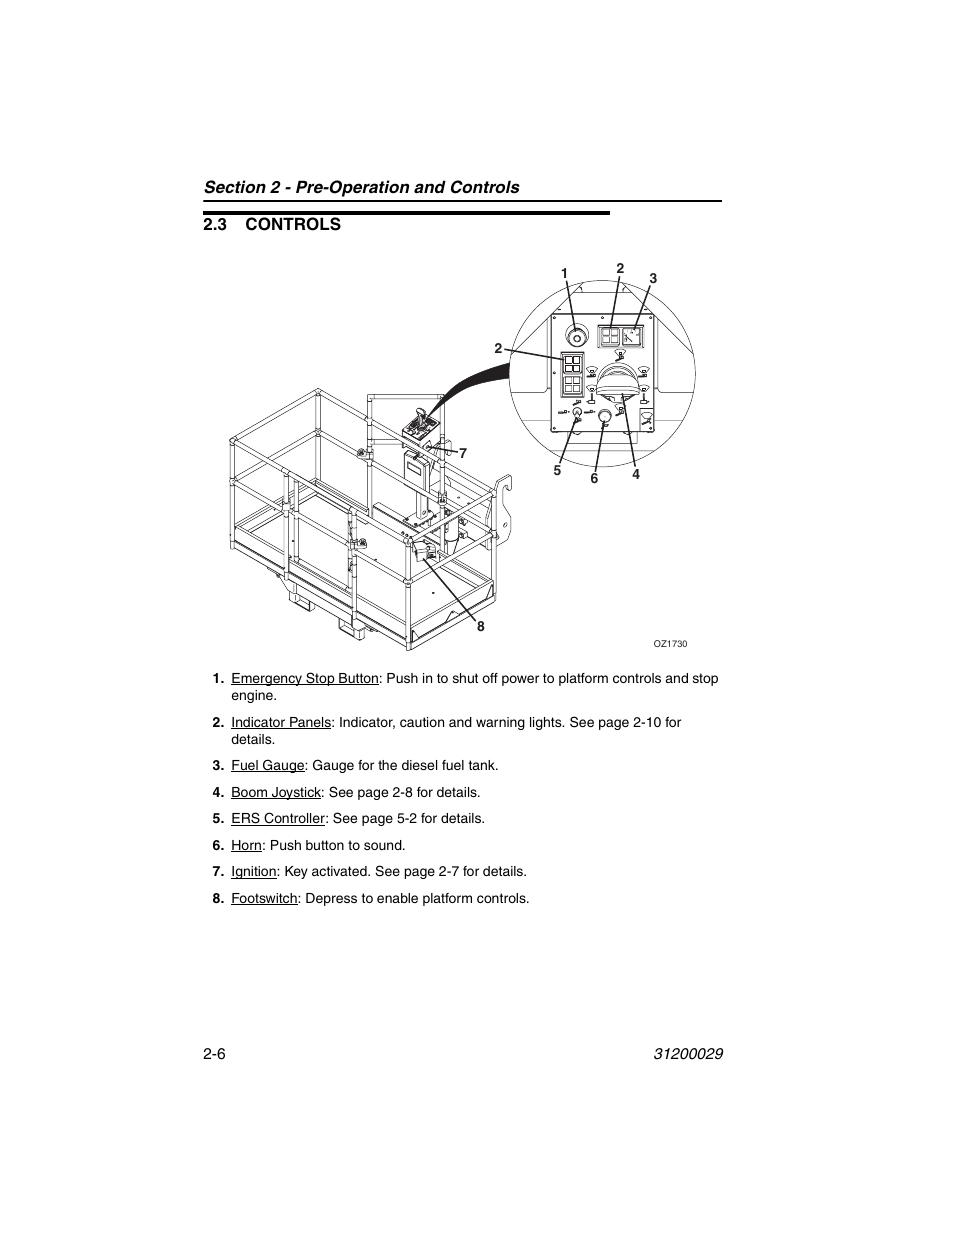 3 controls 3 controls 6 jlg 4017 platform operator manual user  3 controls 3 controls 6 jlg 4017 platform operator manual user manual page 24 64